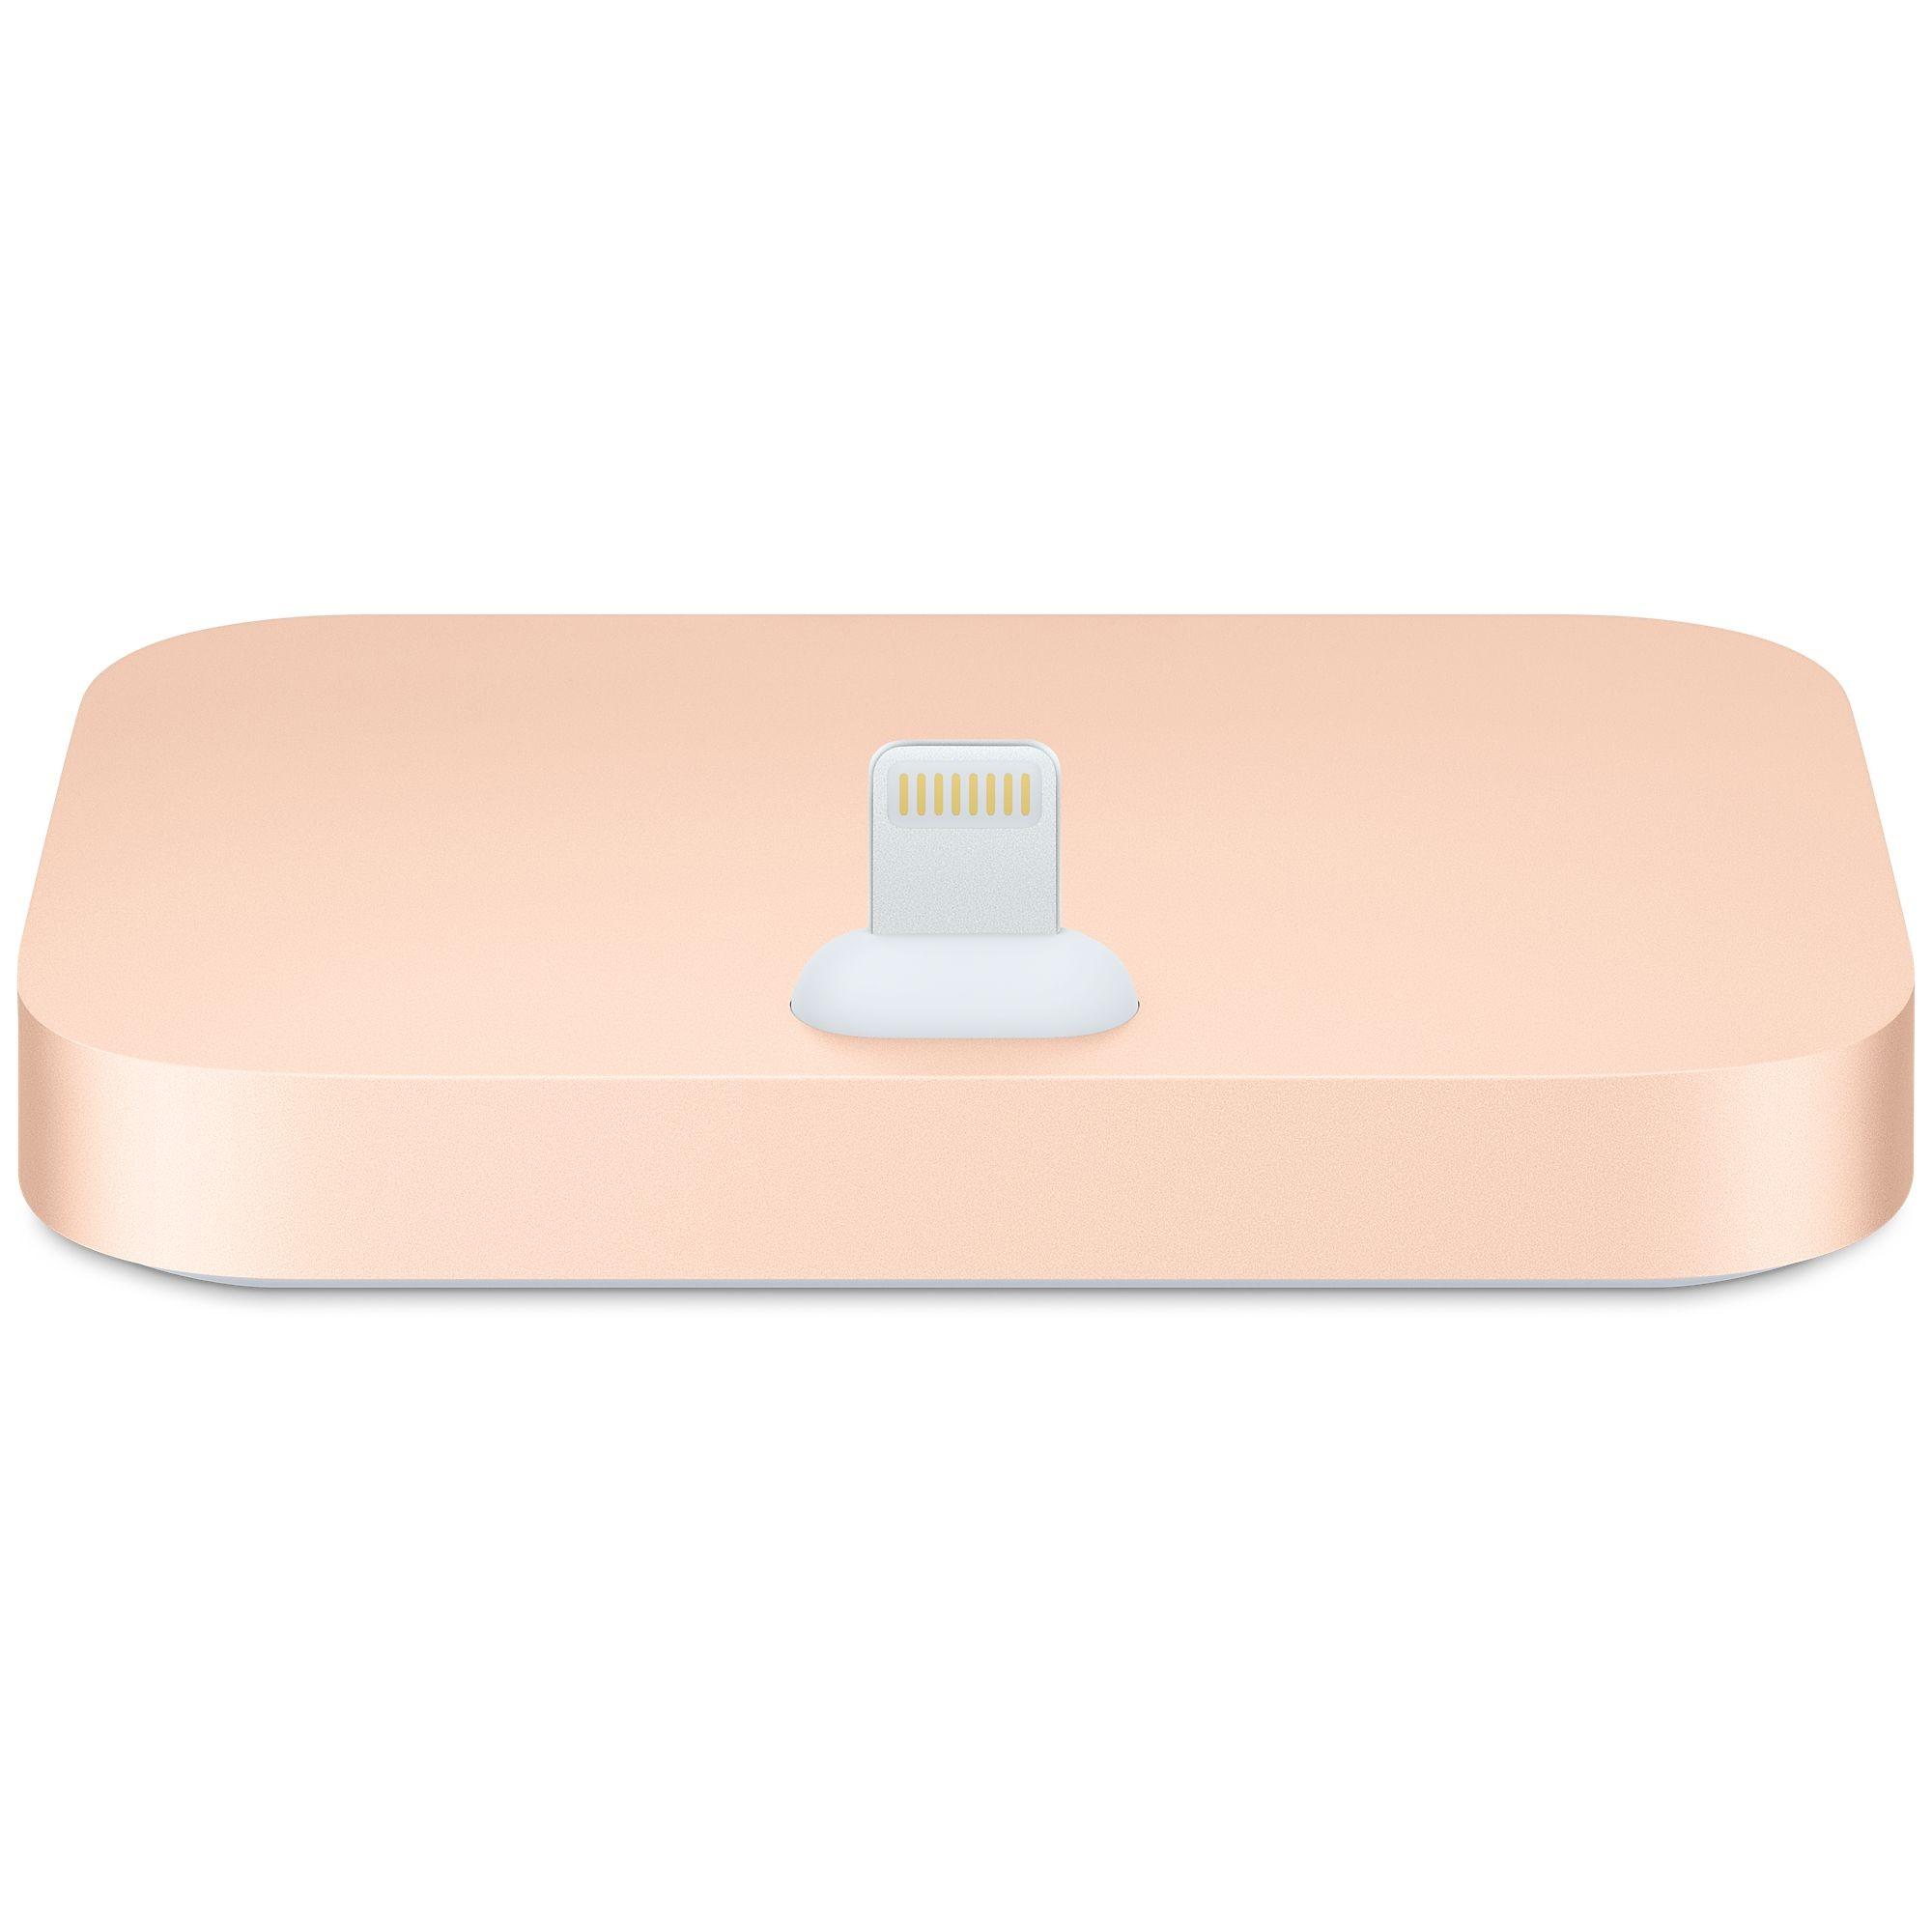 Apple iPhone Lightning Dock - zlatý mqhx2zm/a